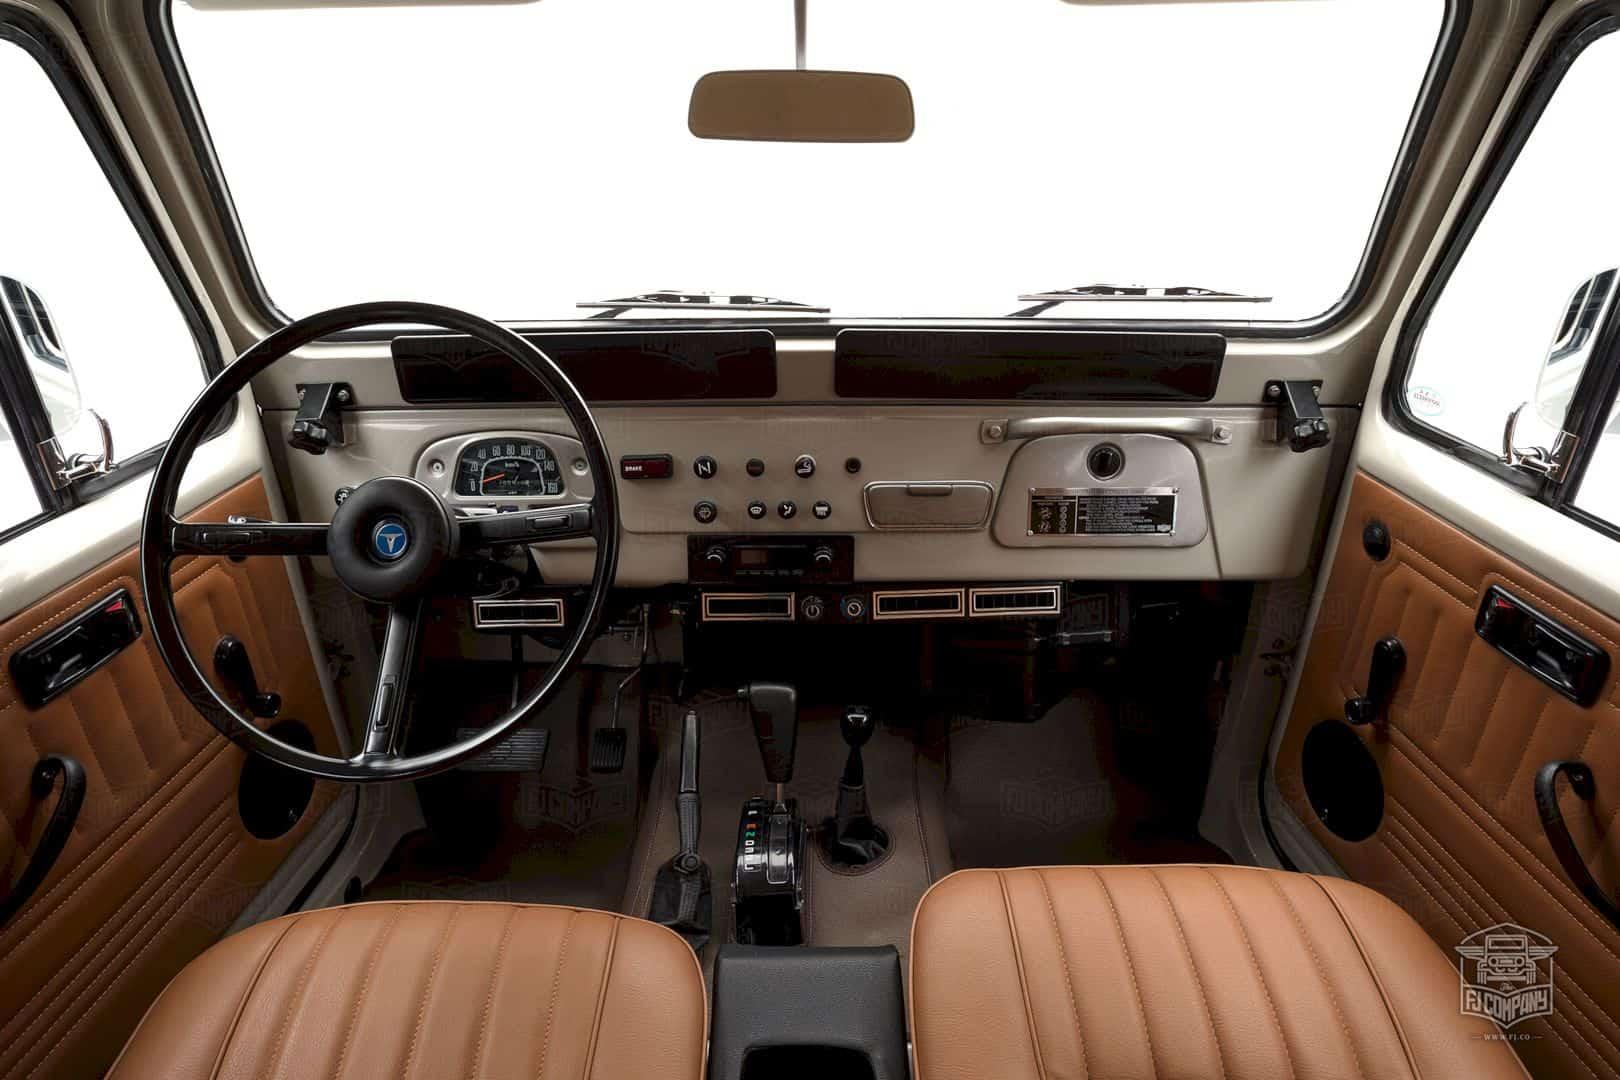 1981 Toyota Land Cruiser Fj45 Beige 4